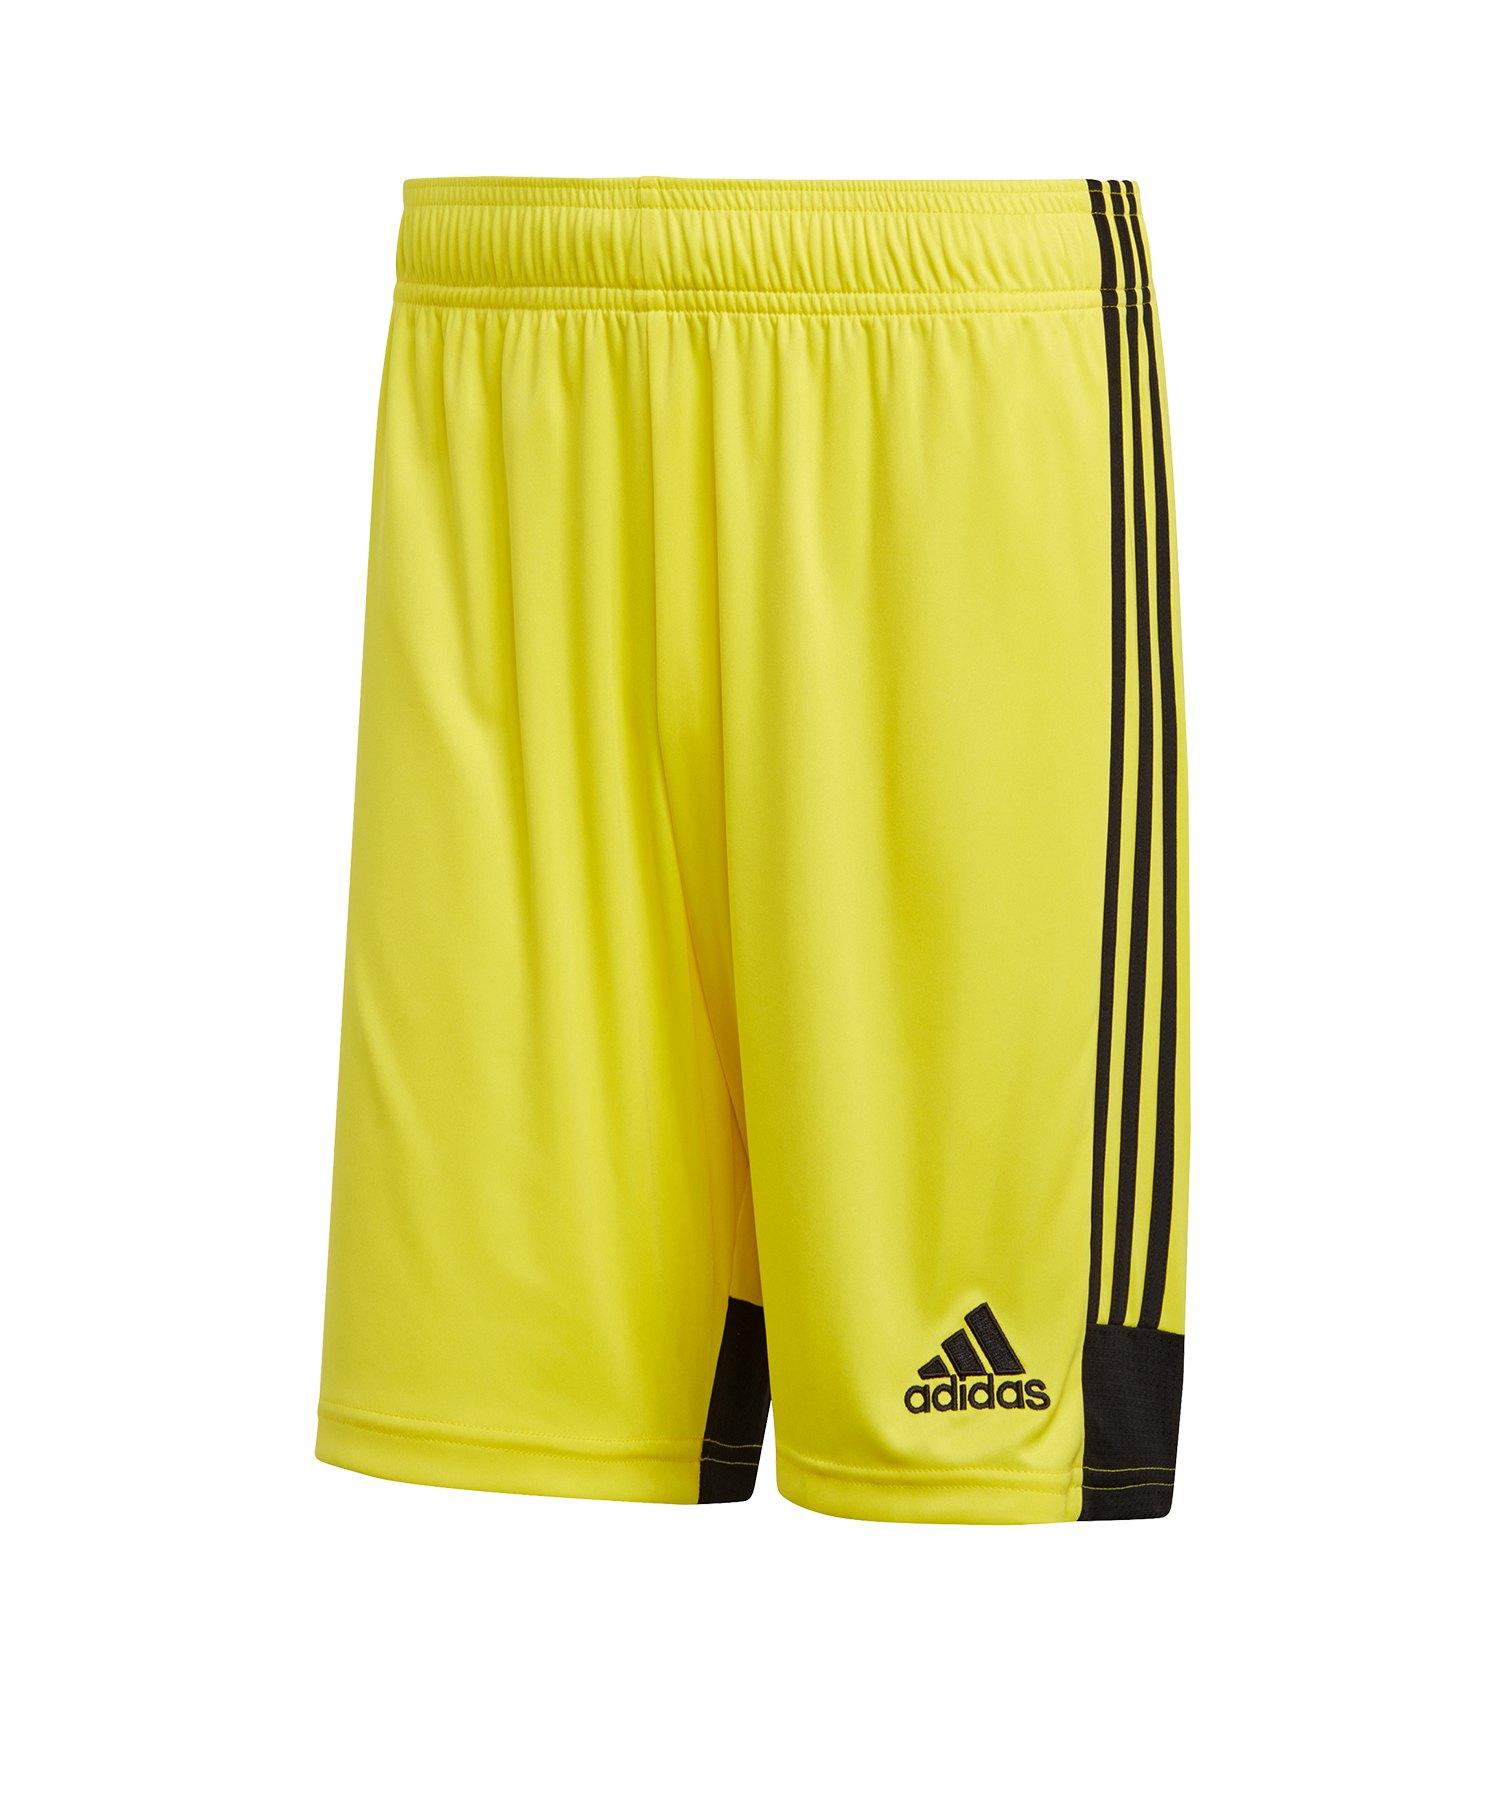 adidas Tastigo 19 Short Gelb Schwarz - gelb